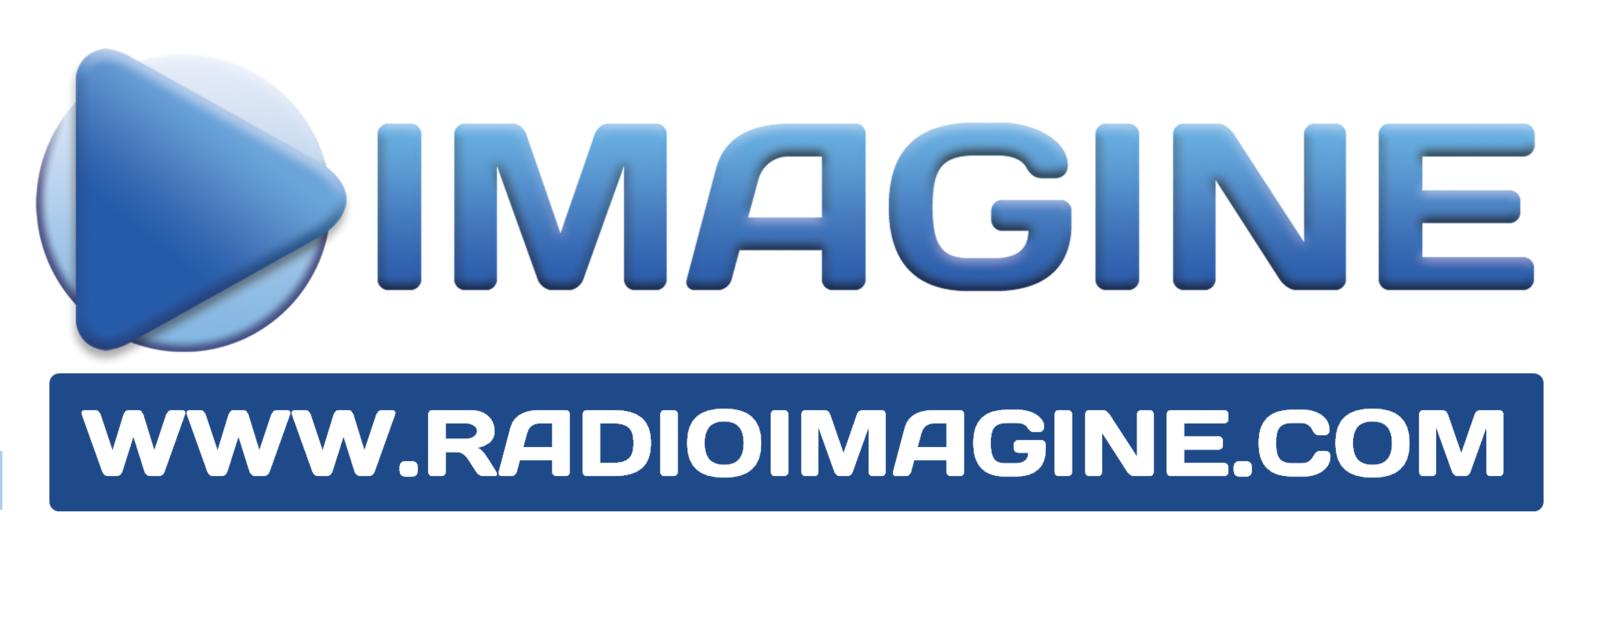 Radio Imagine - Sports Hautes-Alpes : Dix-Huitieme Numero